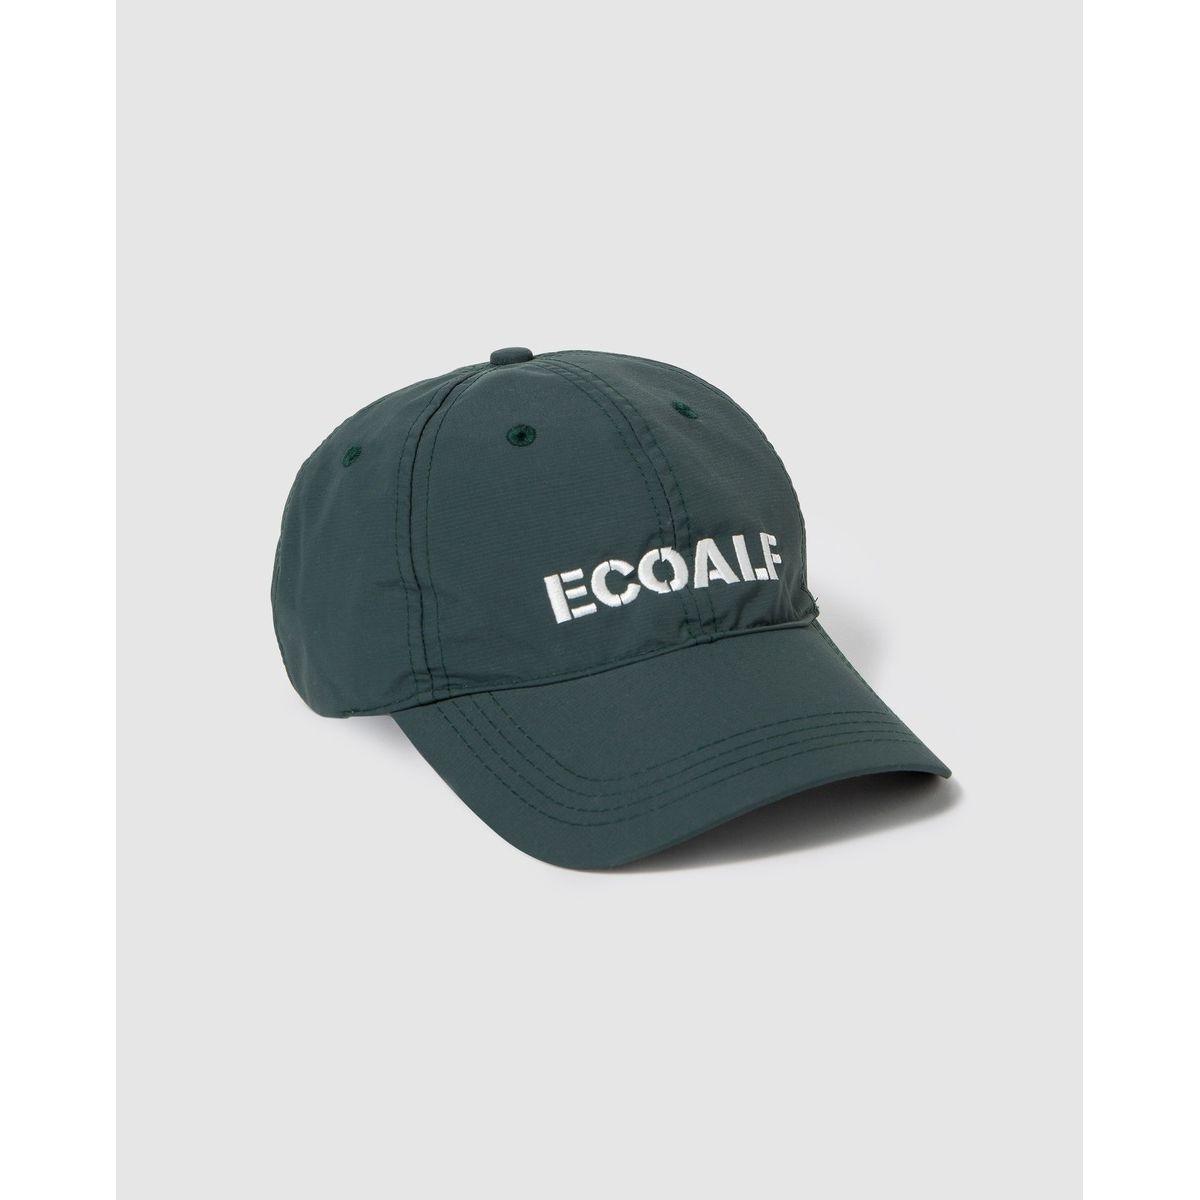 Casquette by Ecoalf  avec logo